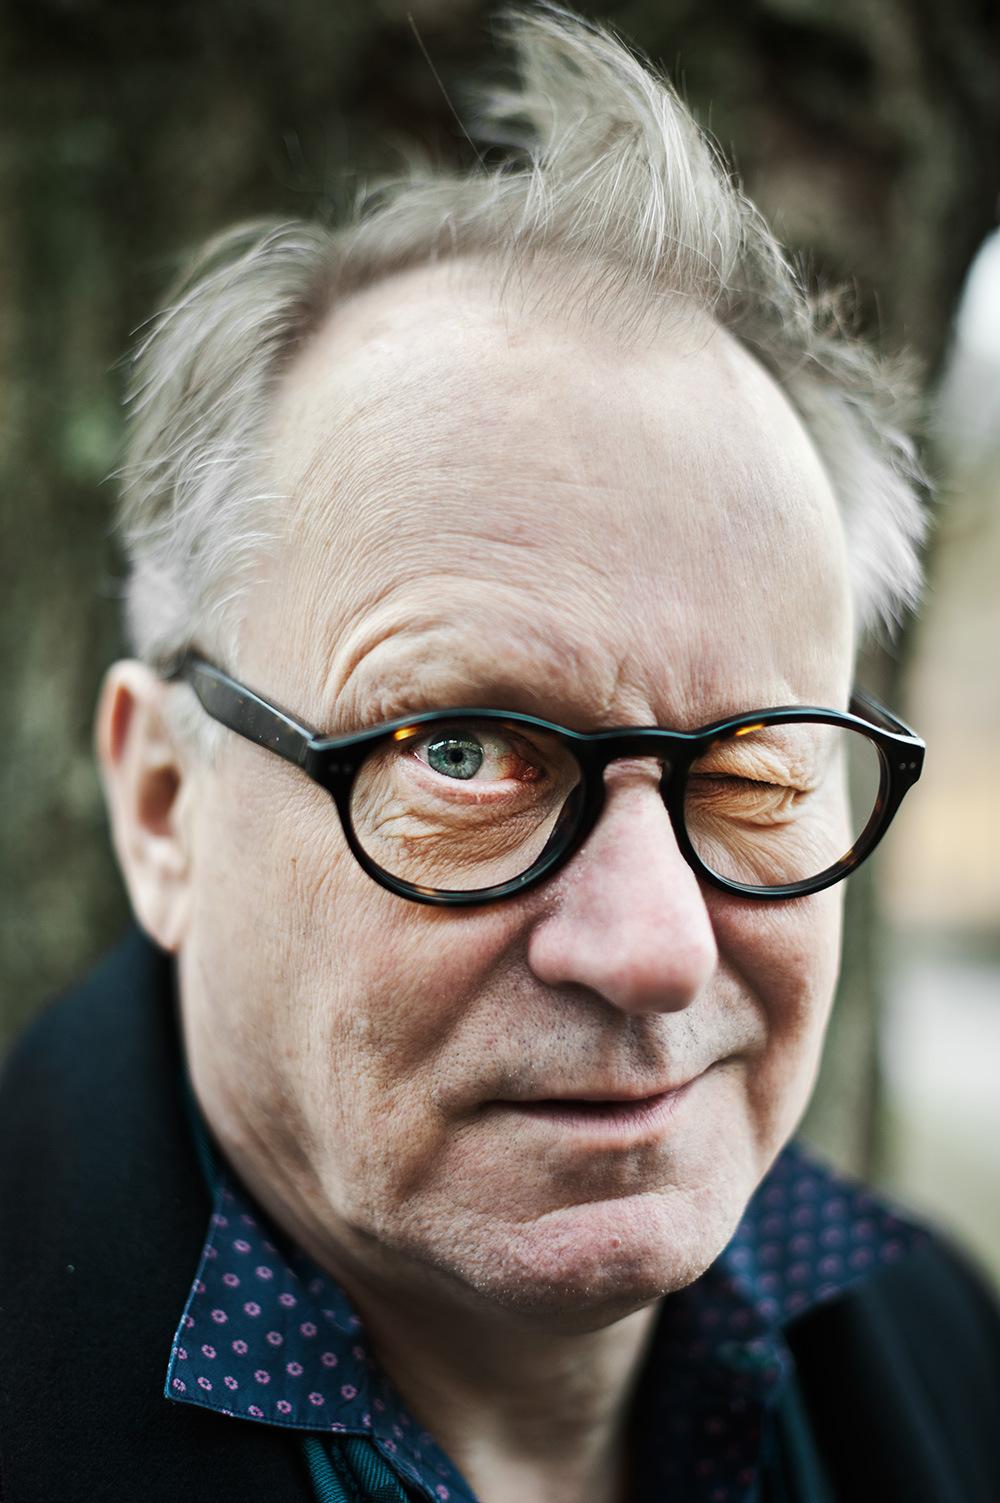 Mareike Timm | Photo Journalist - Swedish actor Stellan Skarsgård. For Fokus, 2014.